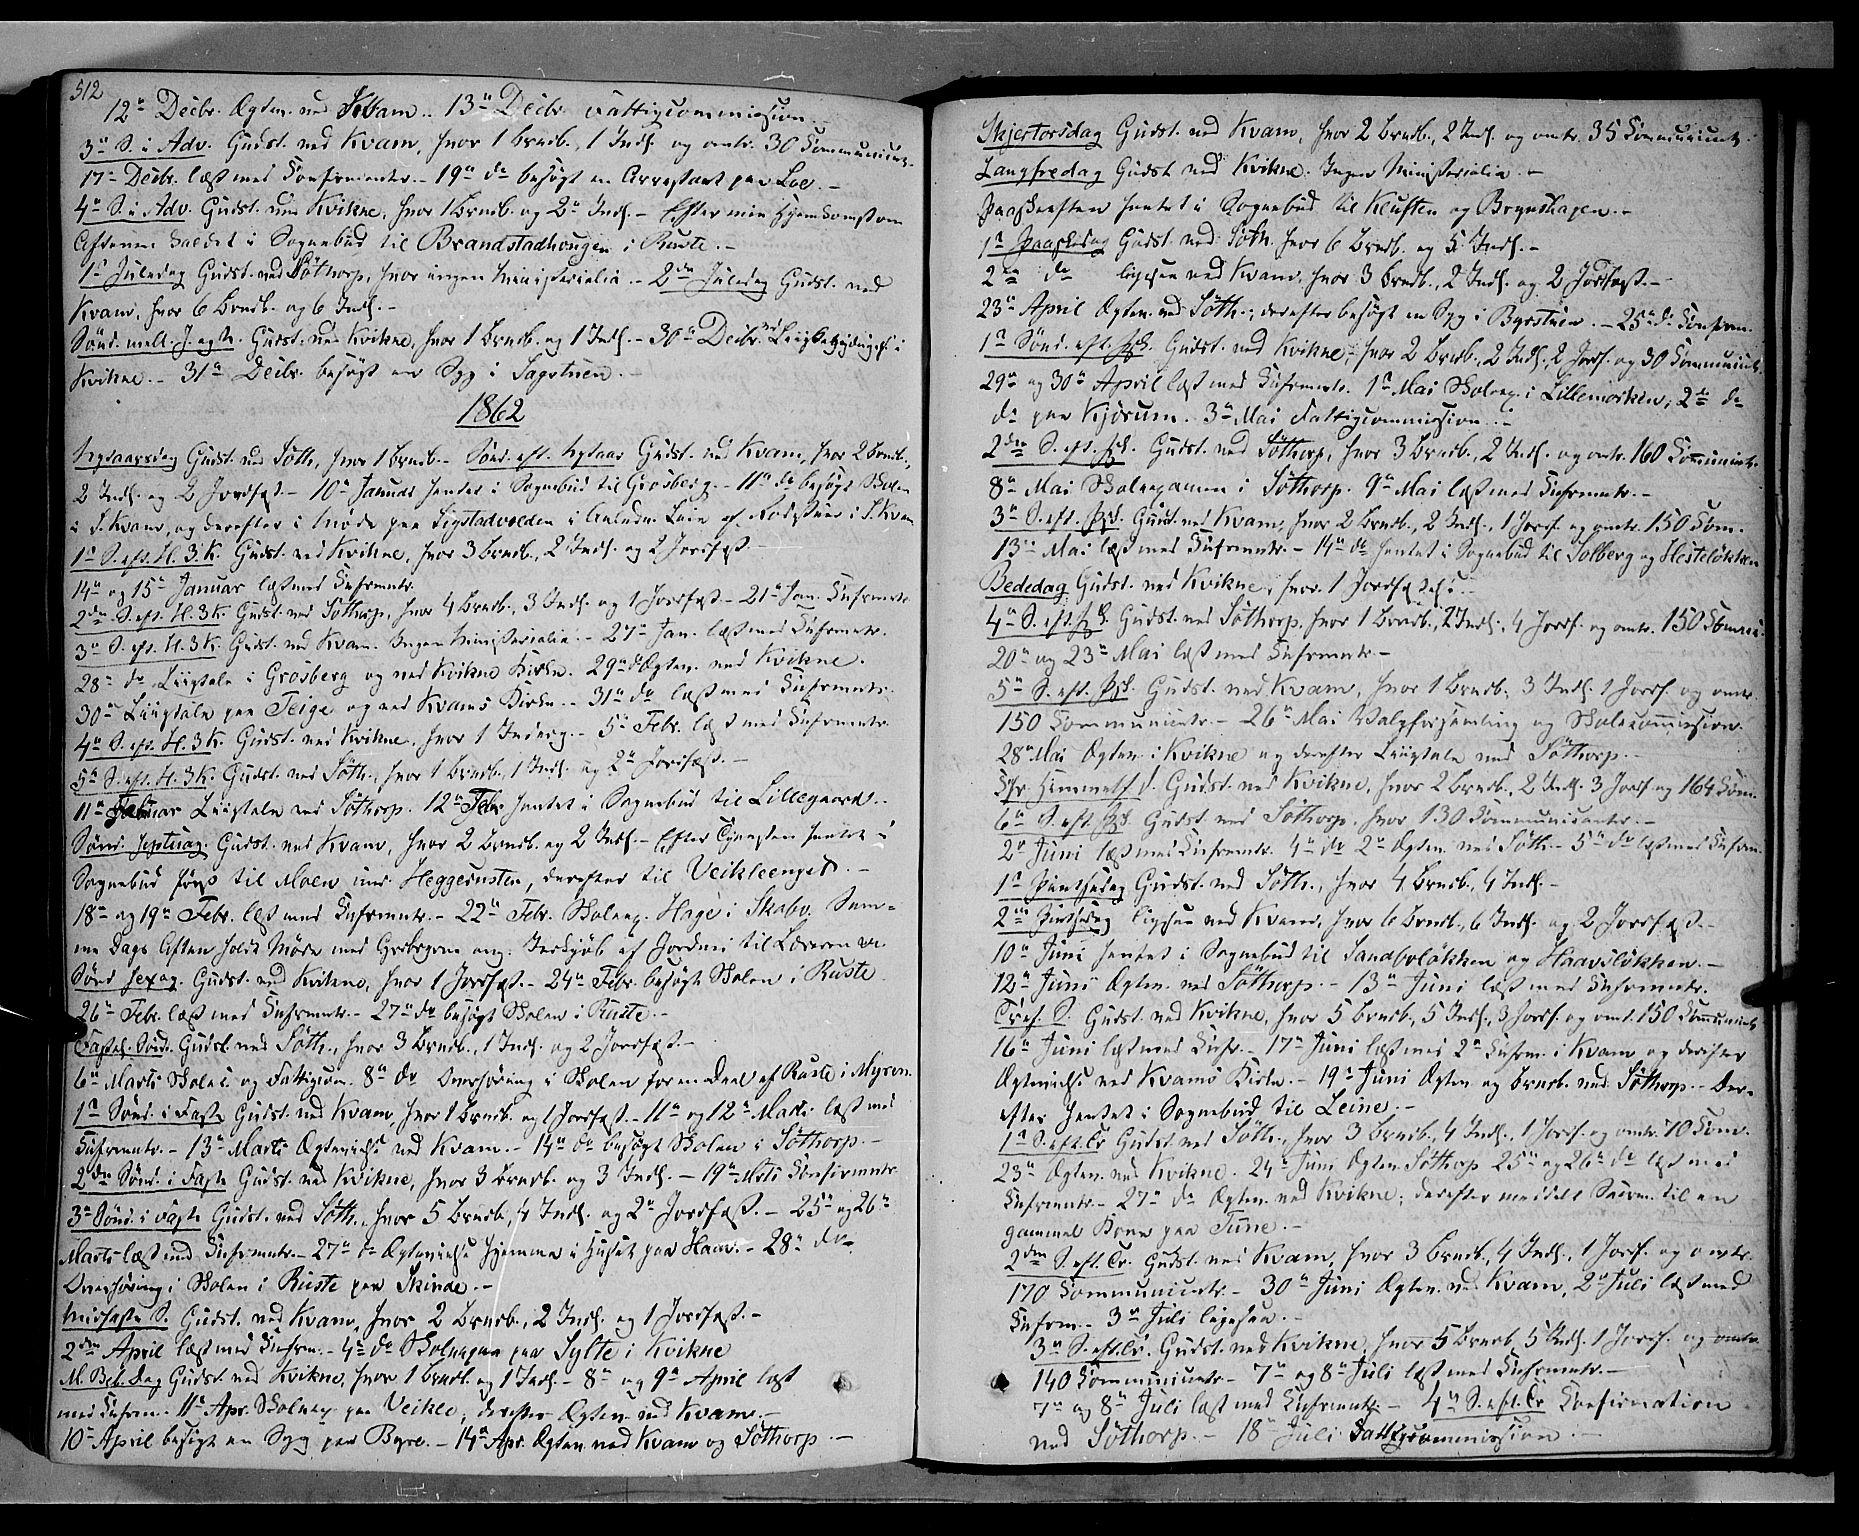 SAH, Nord-Fron prestekontor, Ministerialbok nr. 1, 1851-1864, s. 512